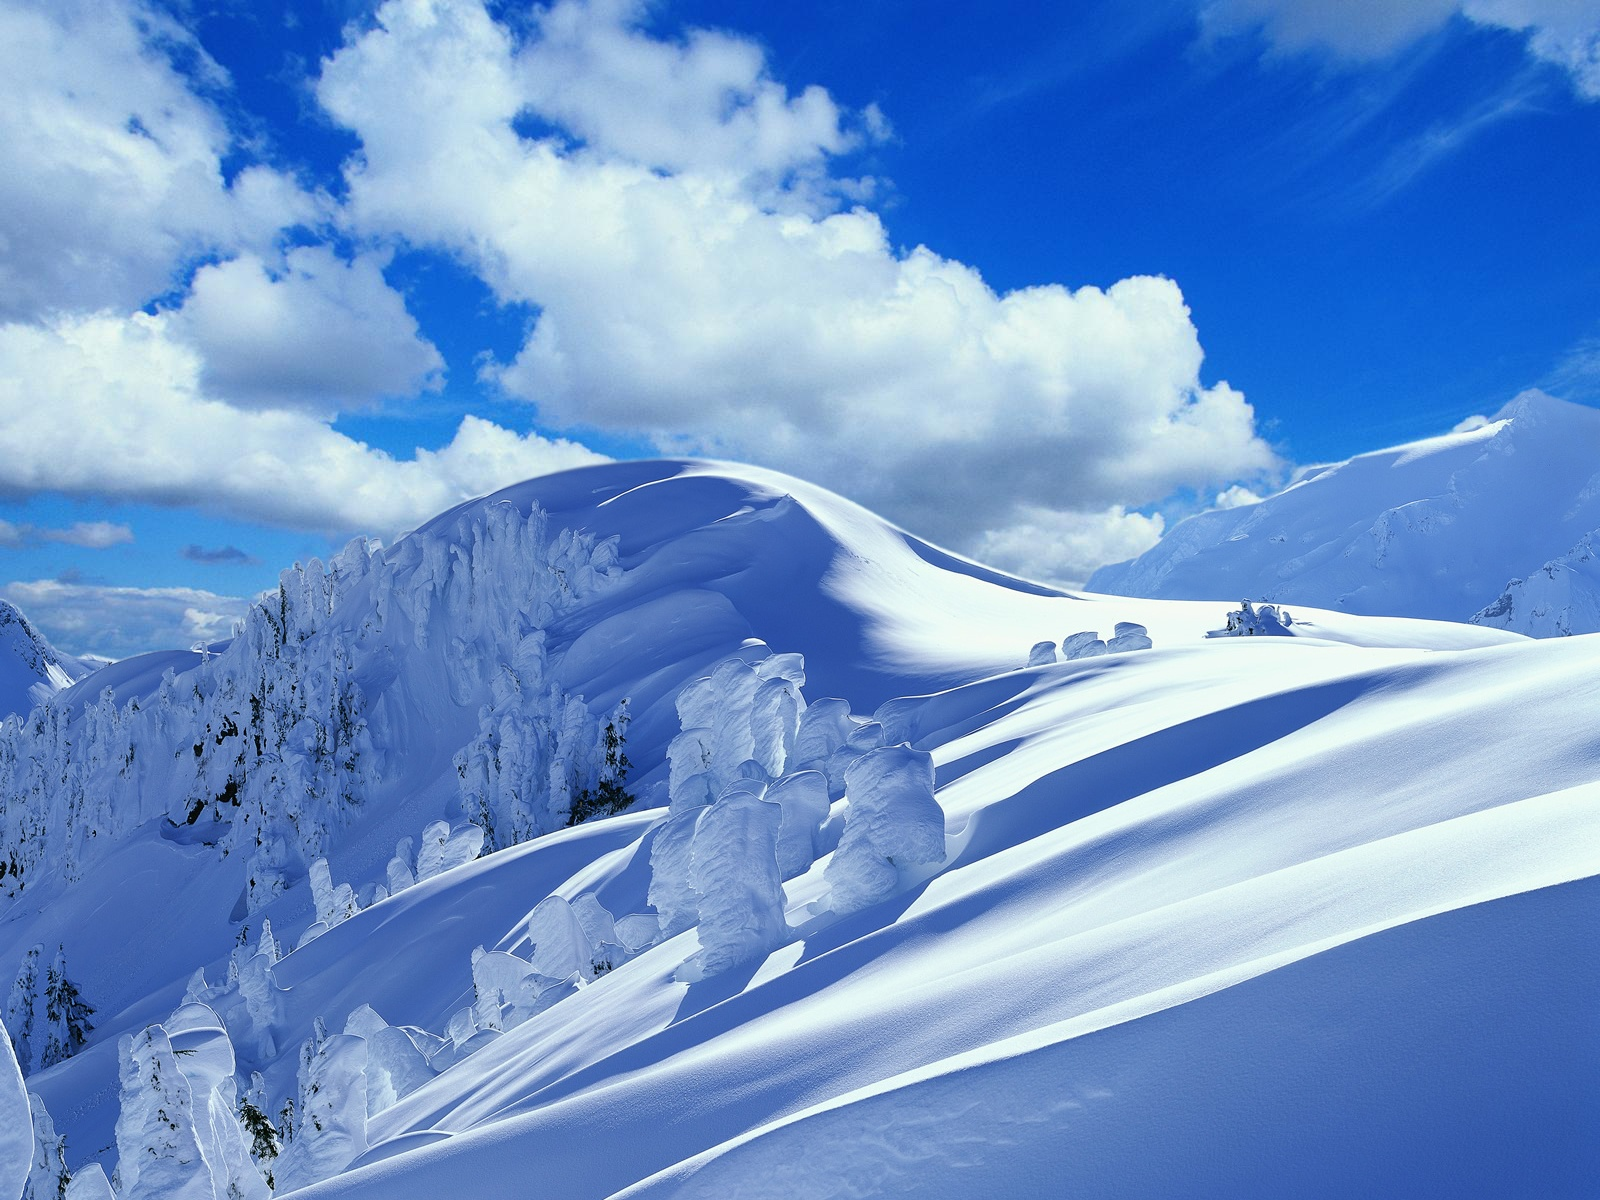 Desktop Backgrounds wallpaper Winter Mountain Desktop Backgrounds 1600x1200